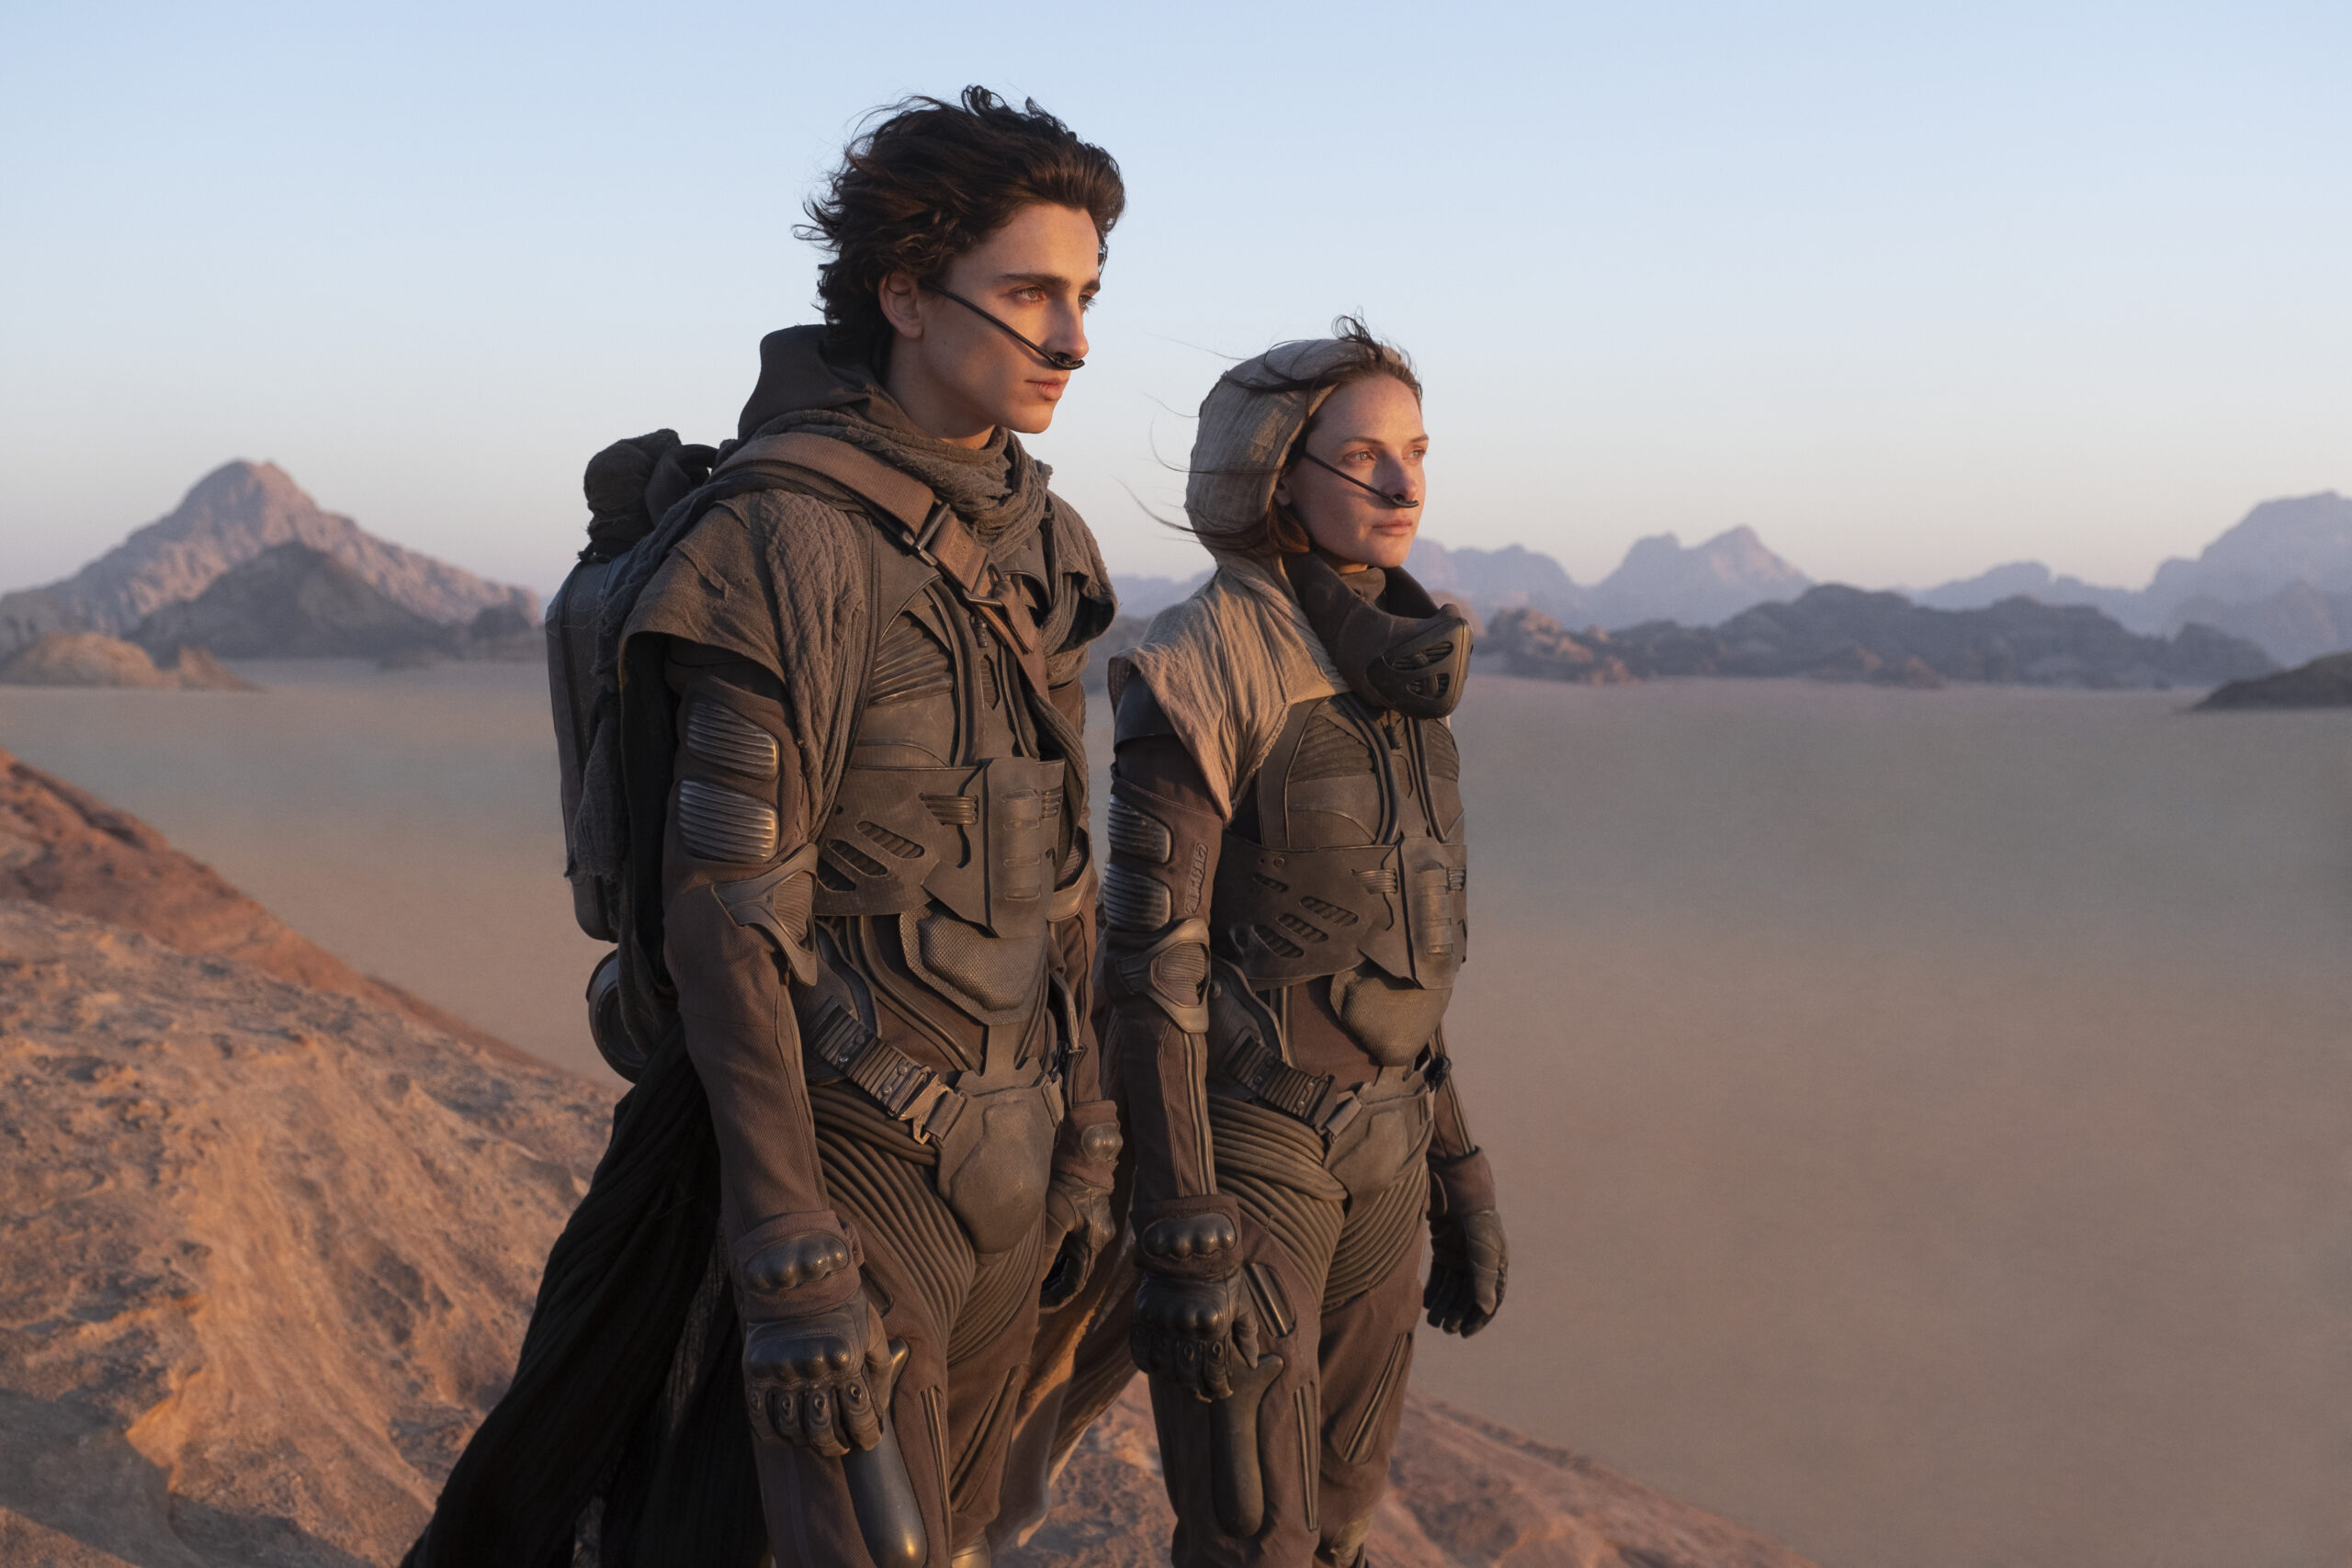 Dune: rinasce suadente e ipnotica al cinema la grande saga di Herbert